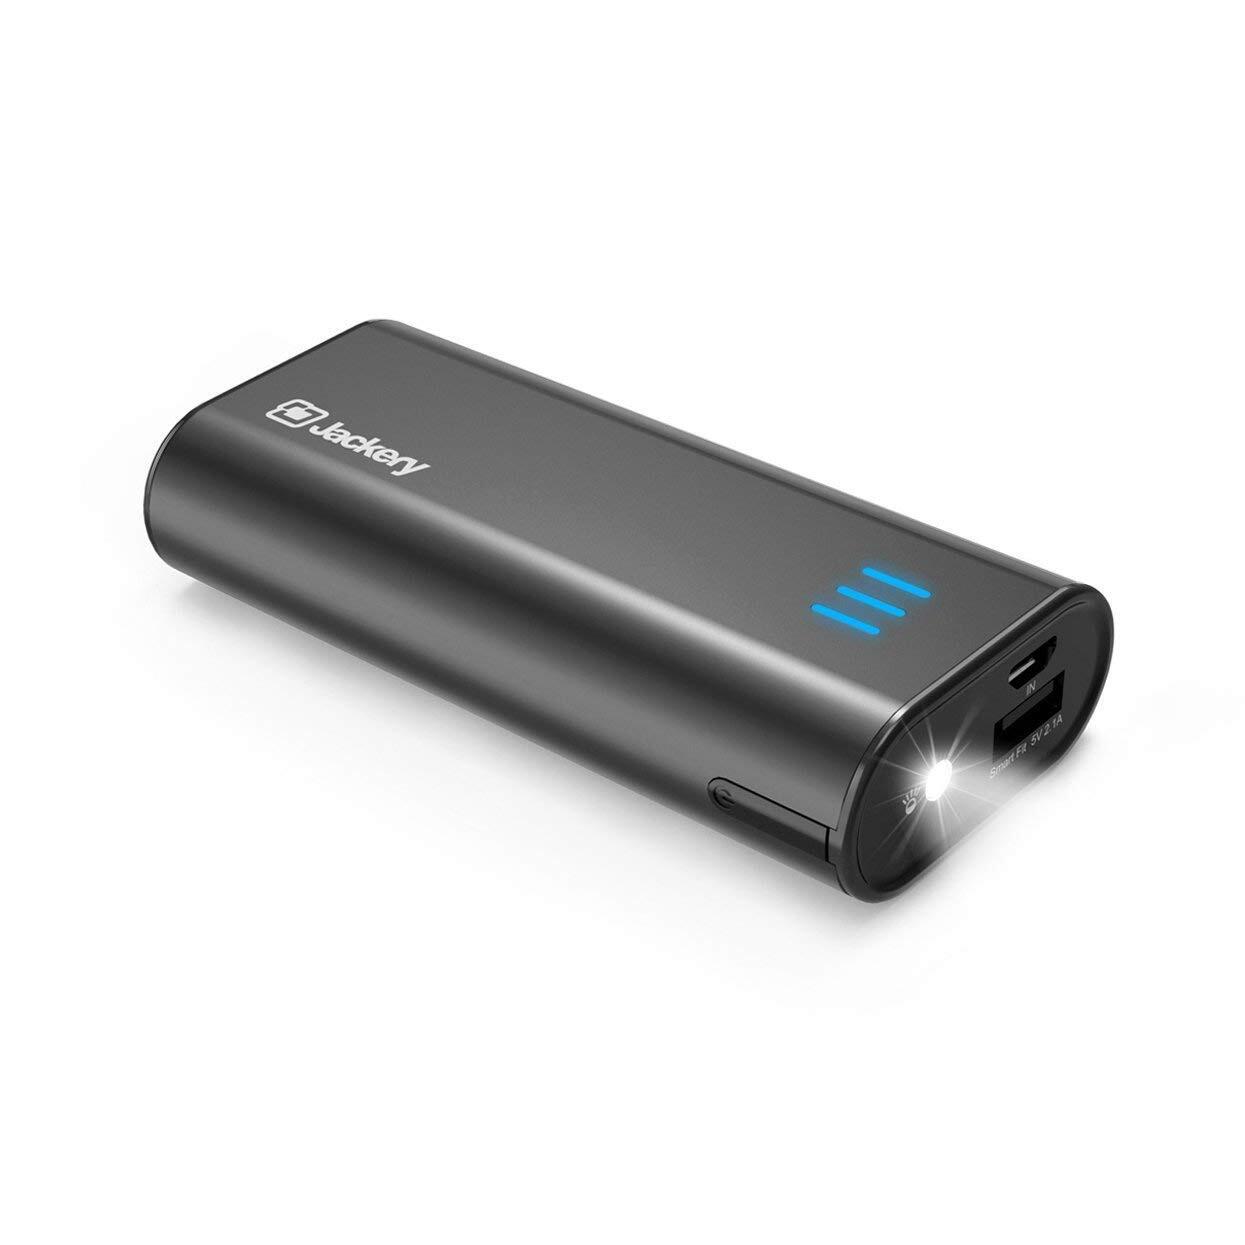 Jackery Portable Charger Bar 6000mAh Pocket-Sized External Battery Pack.jpg